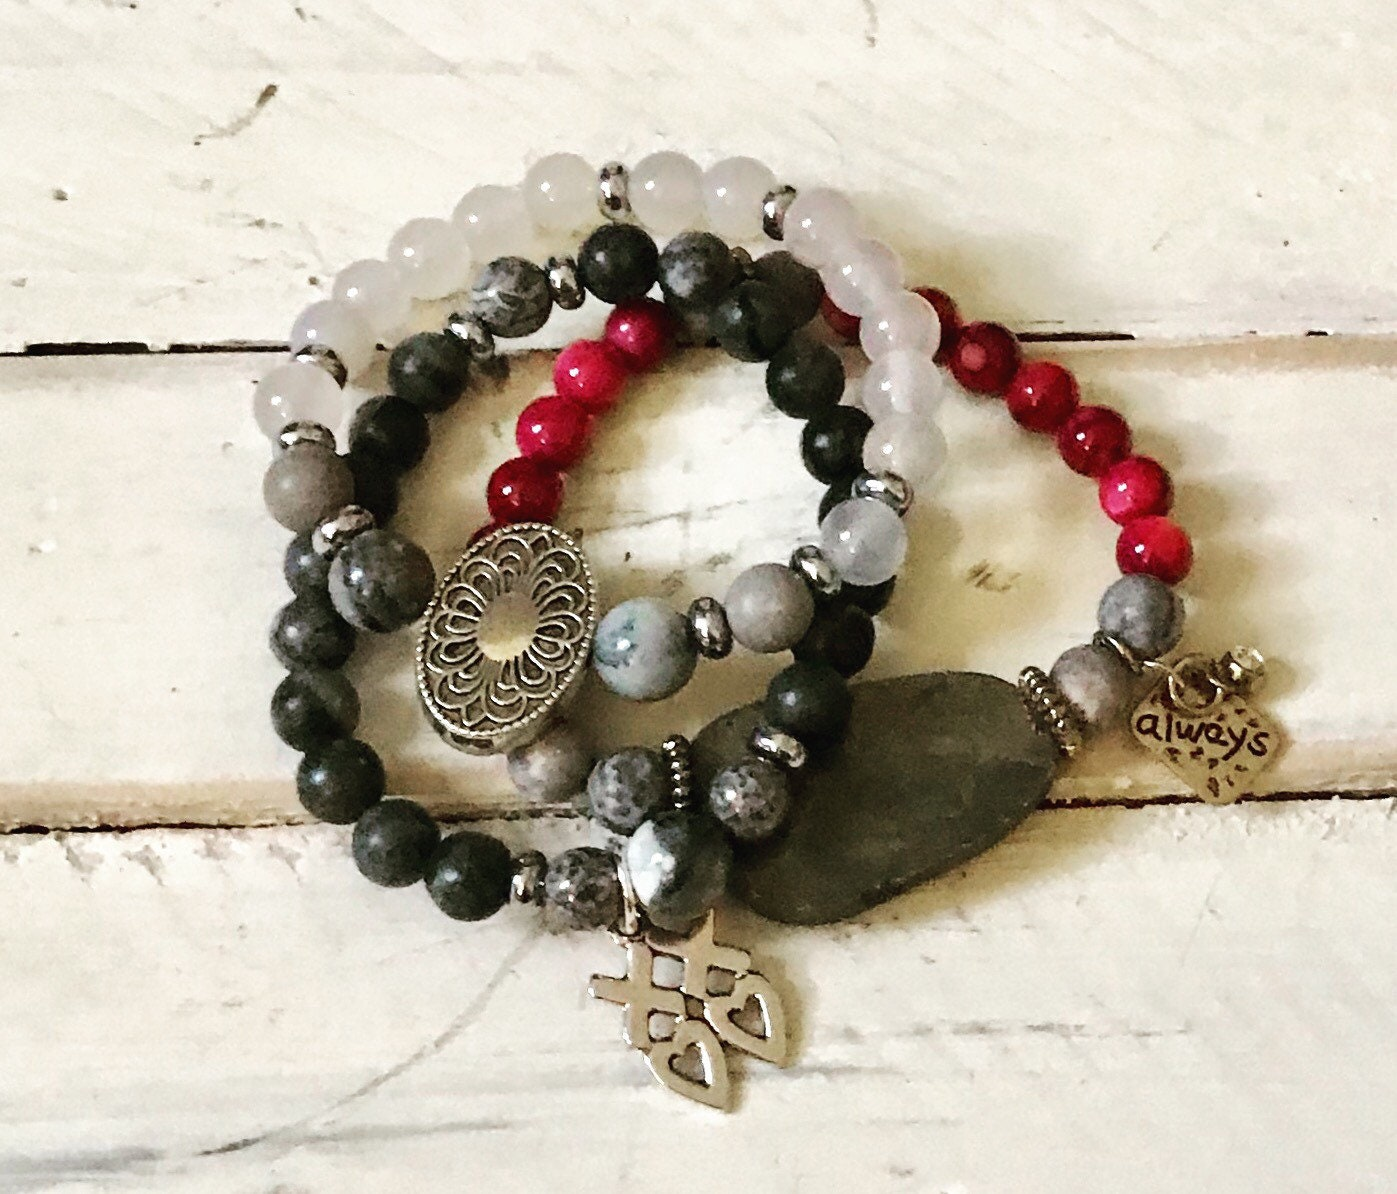 9314b6d9eecfa Gray and pink beaded bracelet set of three-Pyrite stone bracelet-Love charm  bracelet set-Bracelet stacks-Beaded bracelets-Inspirational